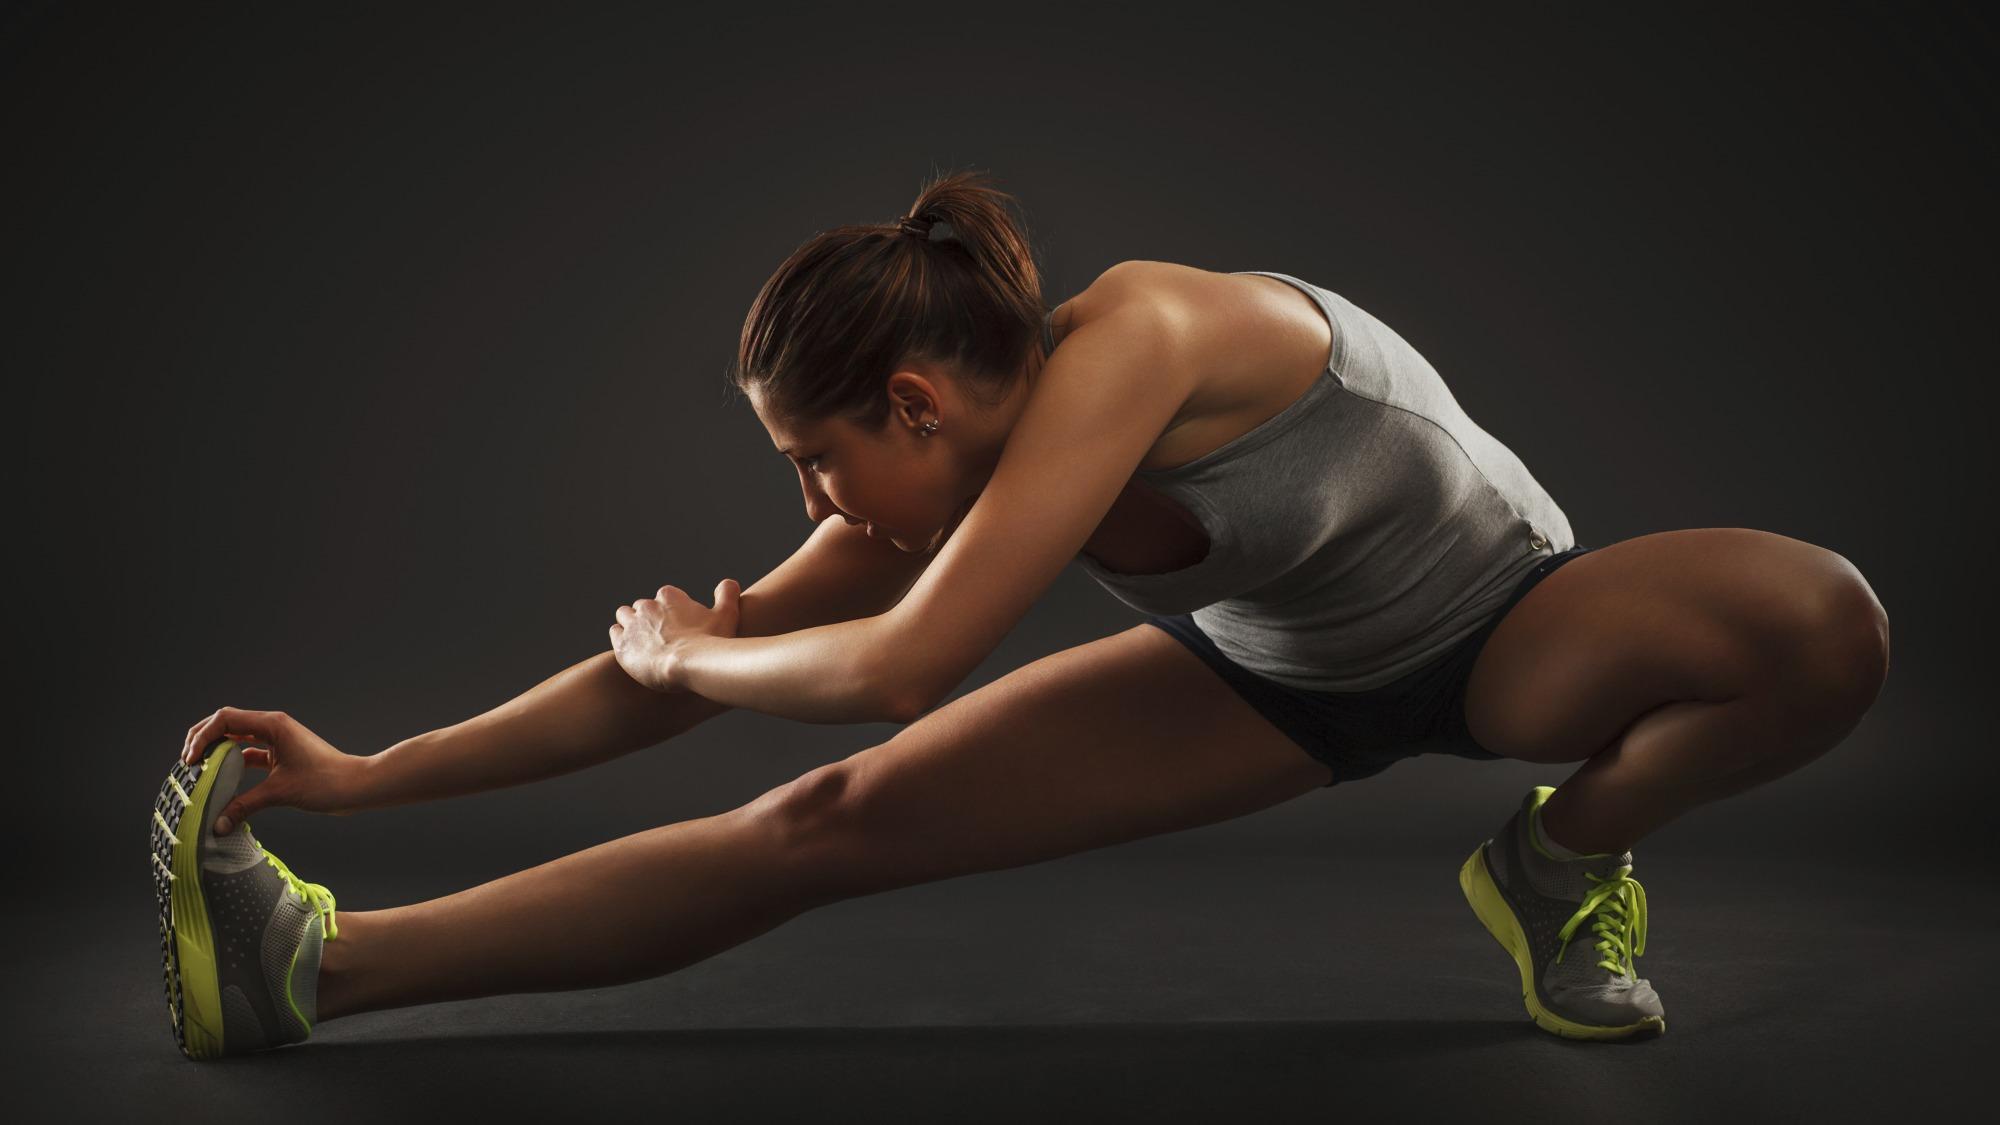 athletes-elongation-runner